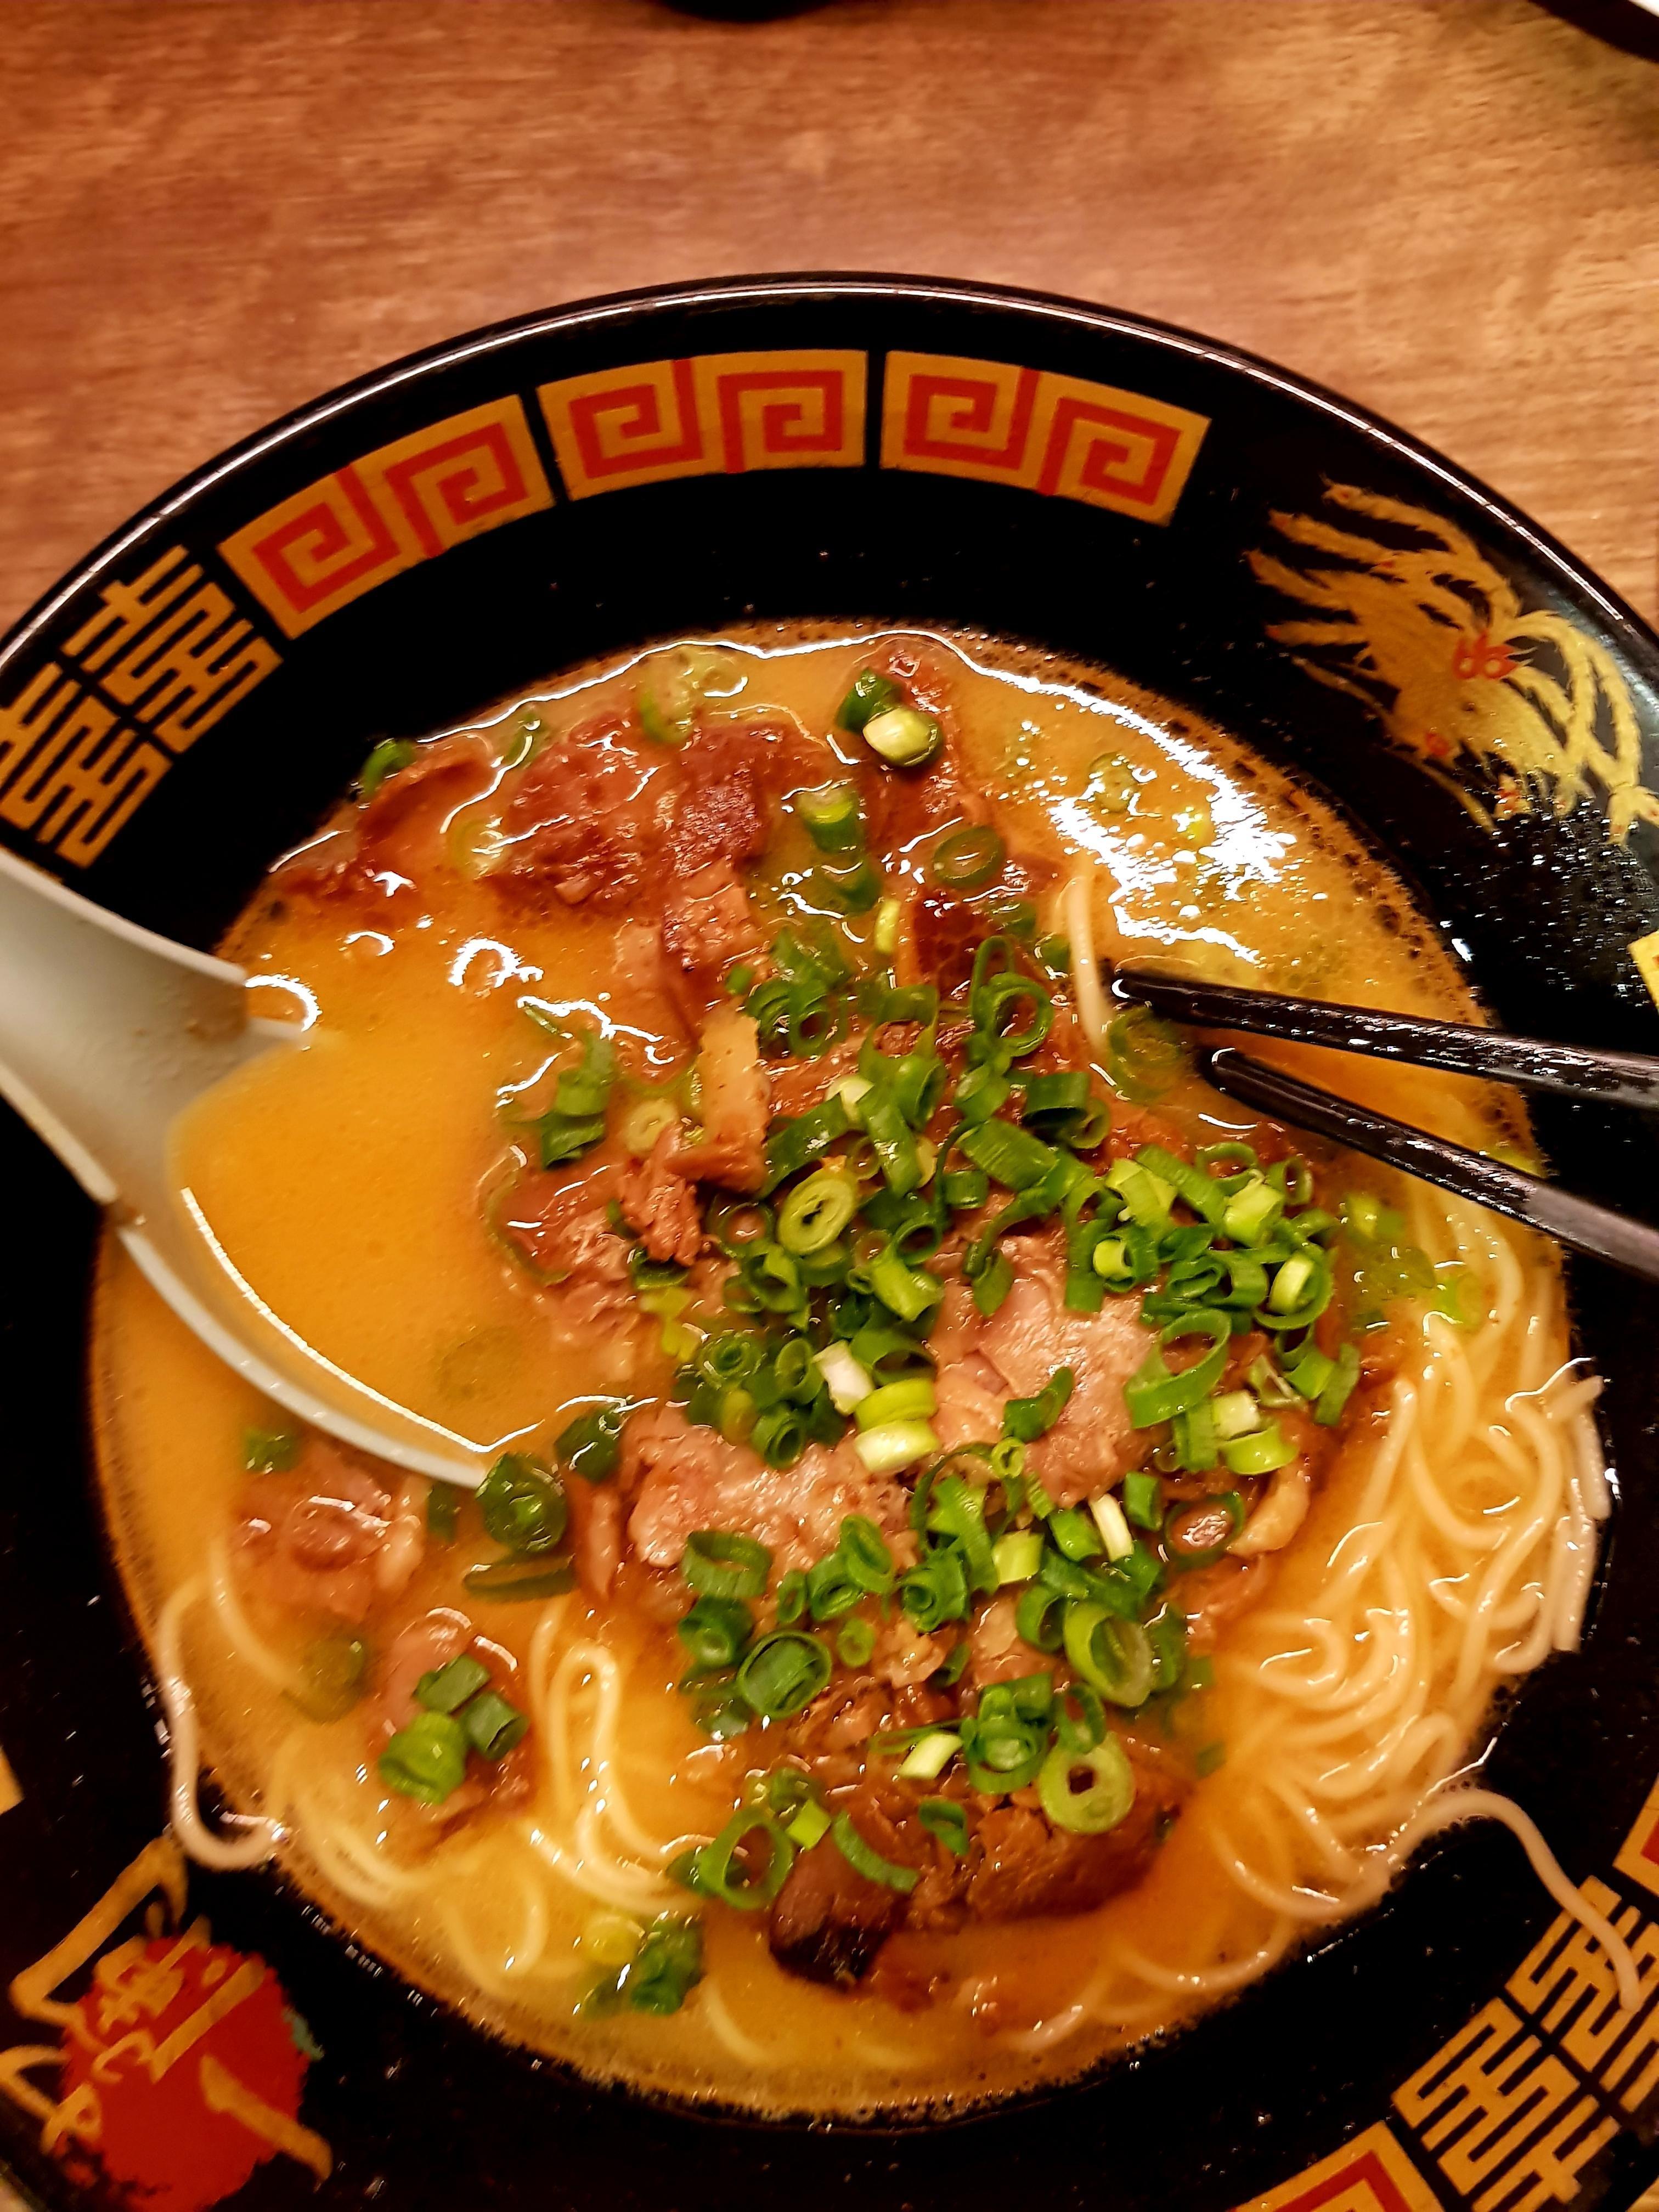 I Ate Ichiran Ramen With Smoke Flavoured Stewed Pork Food